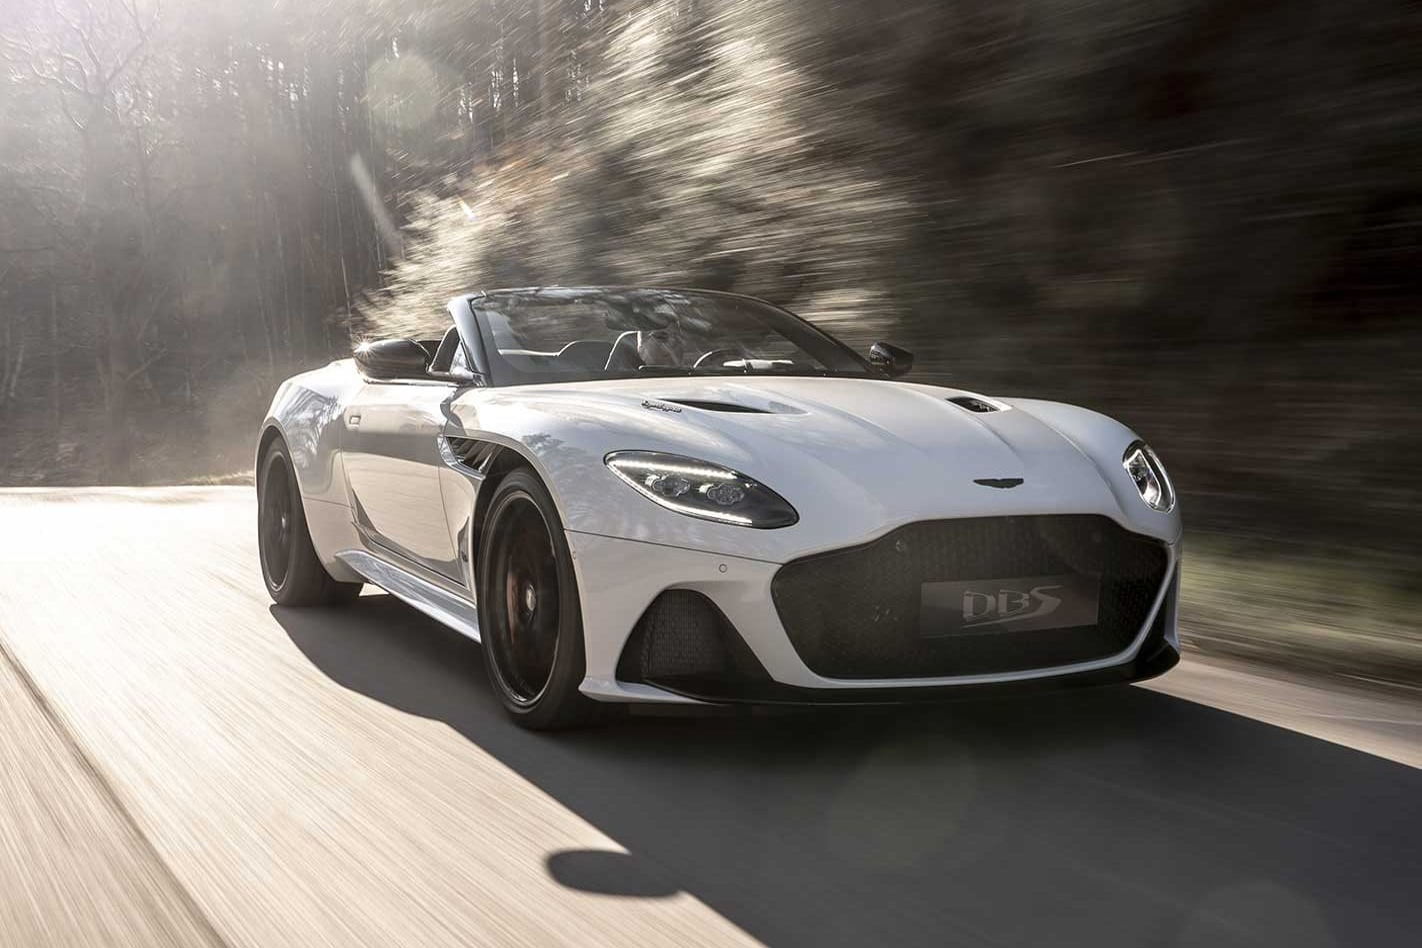 2020 Aston Martin DBS Superleggera Volante revealed